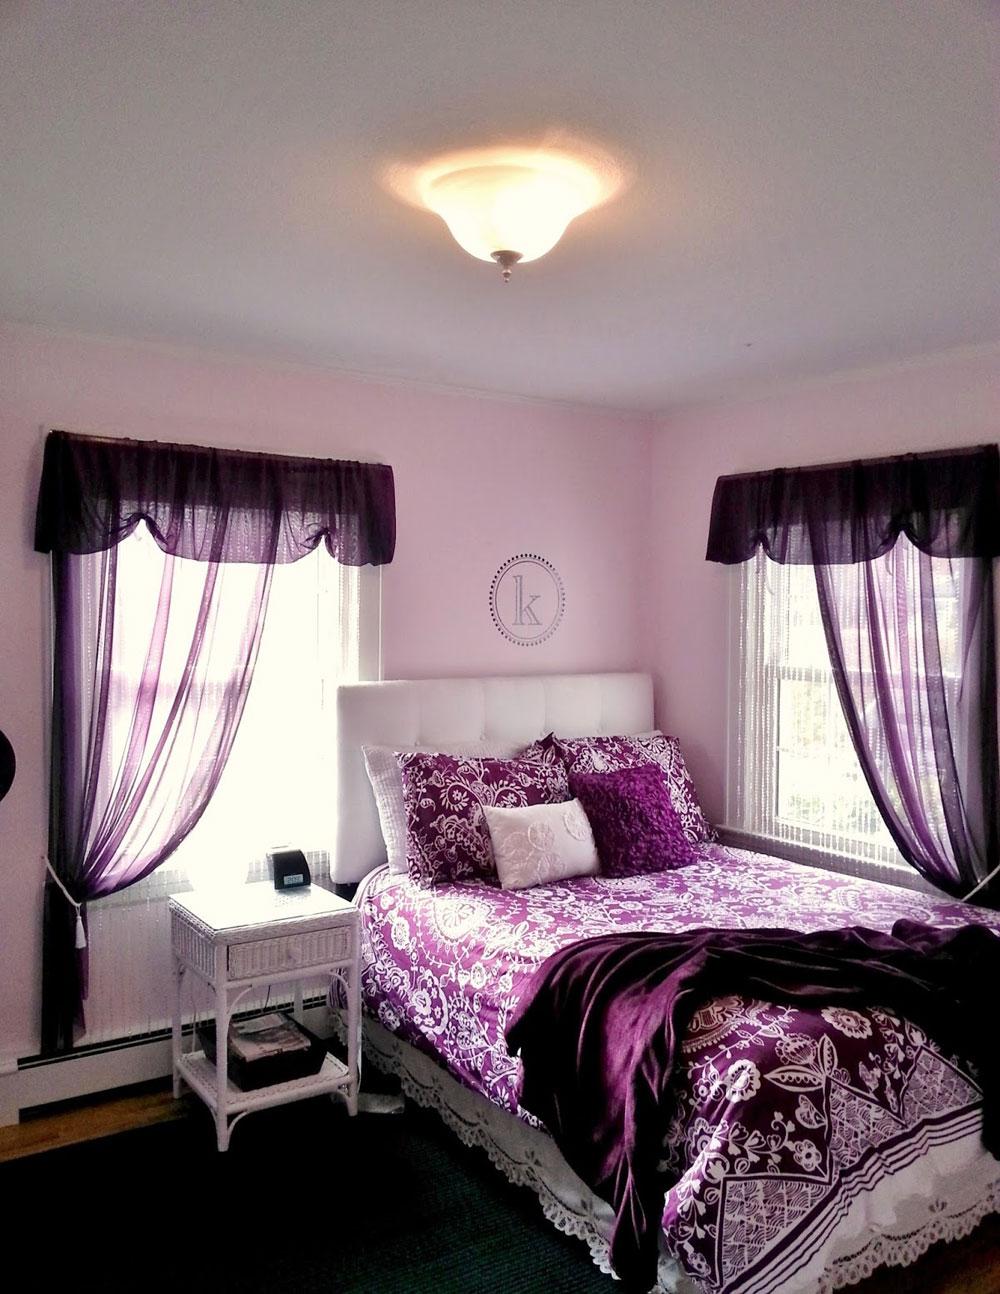 Teen Bedroom Design Ideas-11 Teen Bedroom Design Ideas